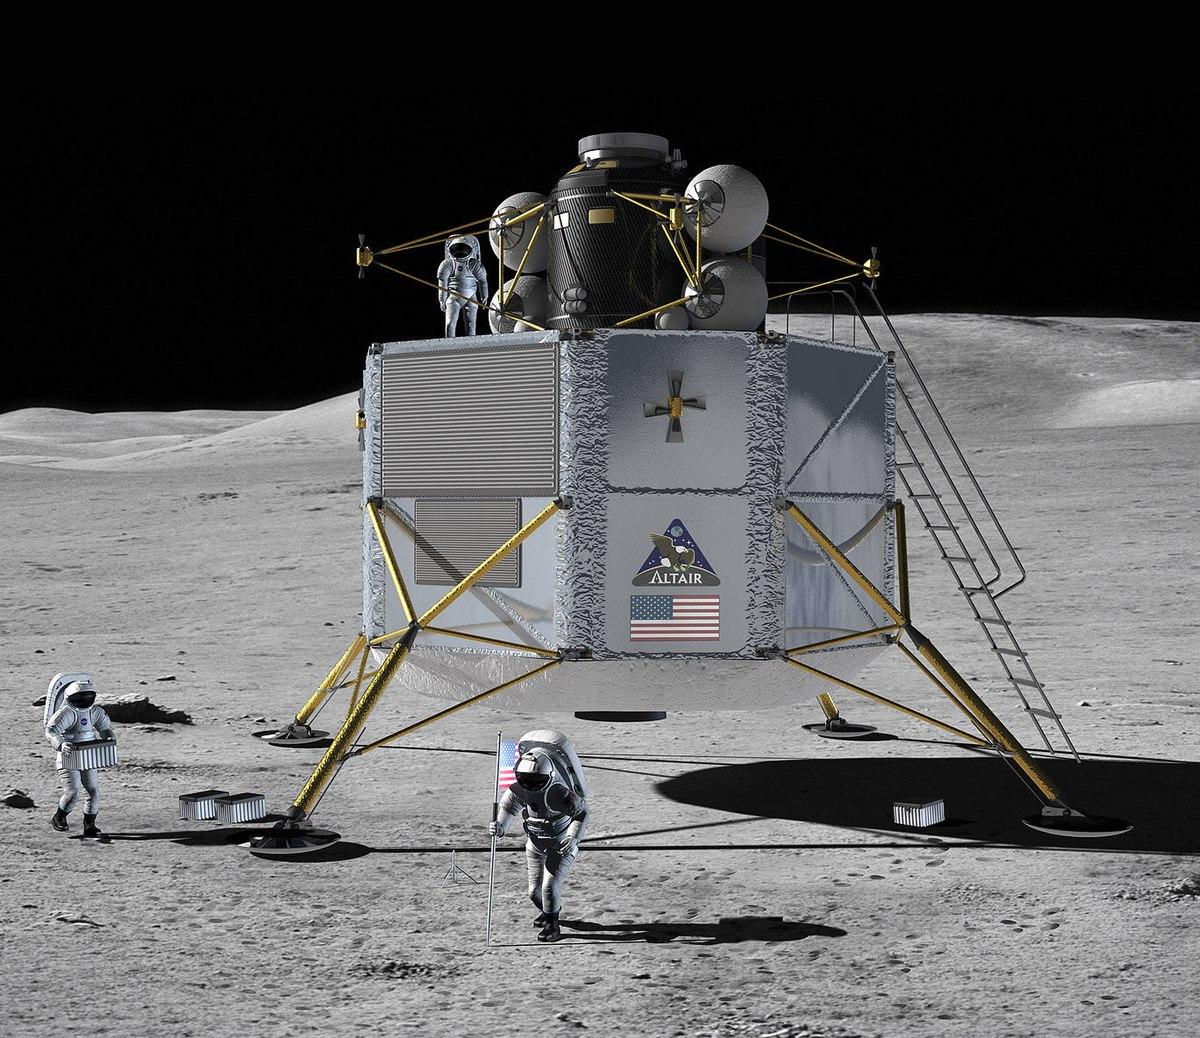 rocket landing on moon - photo #3